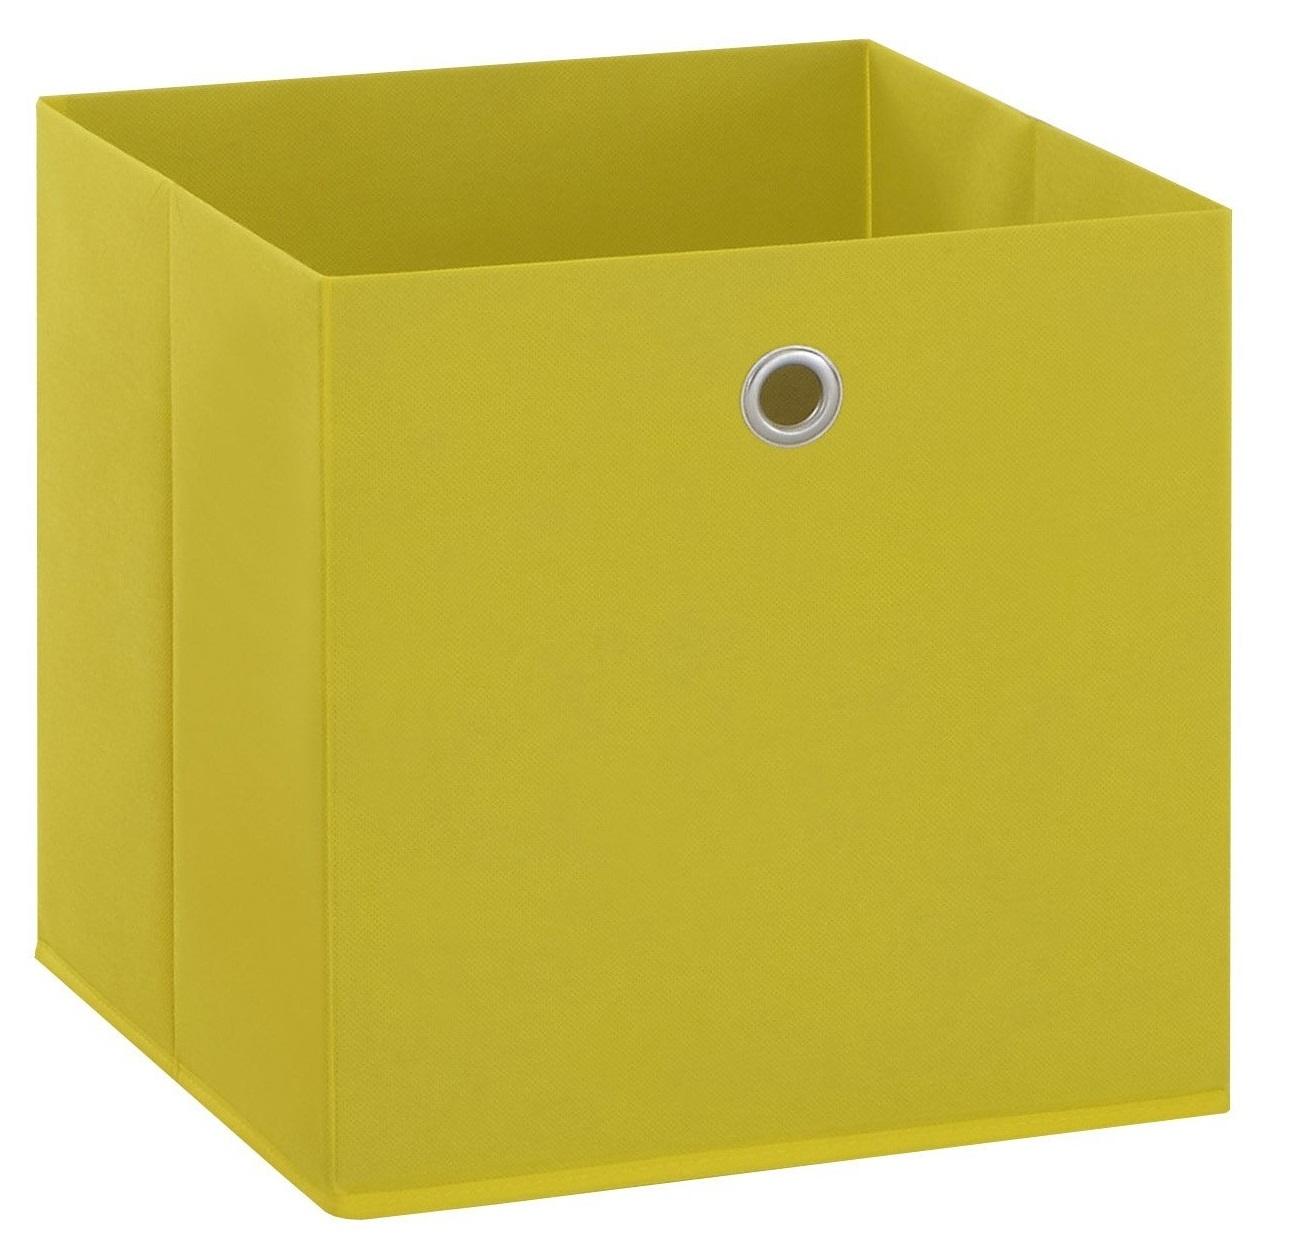 Opbergbox Mega in geel | FD Furniture